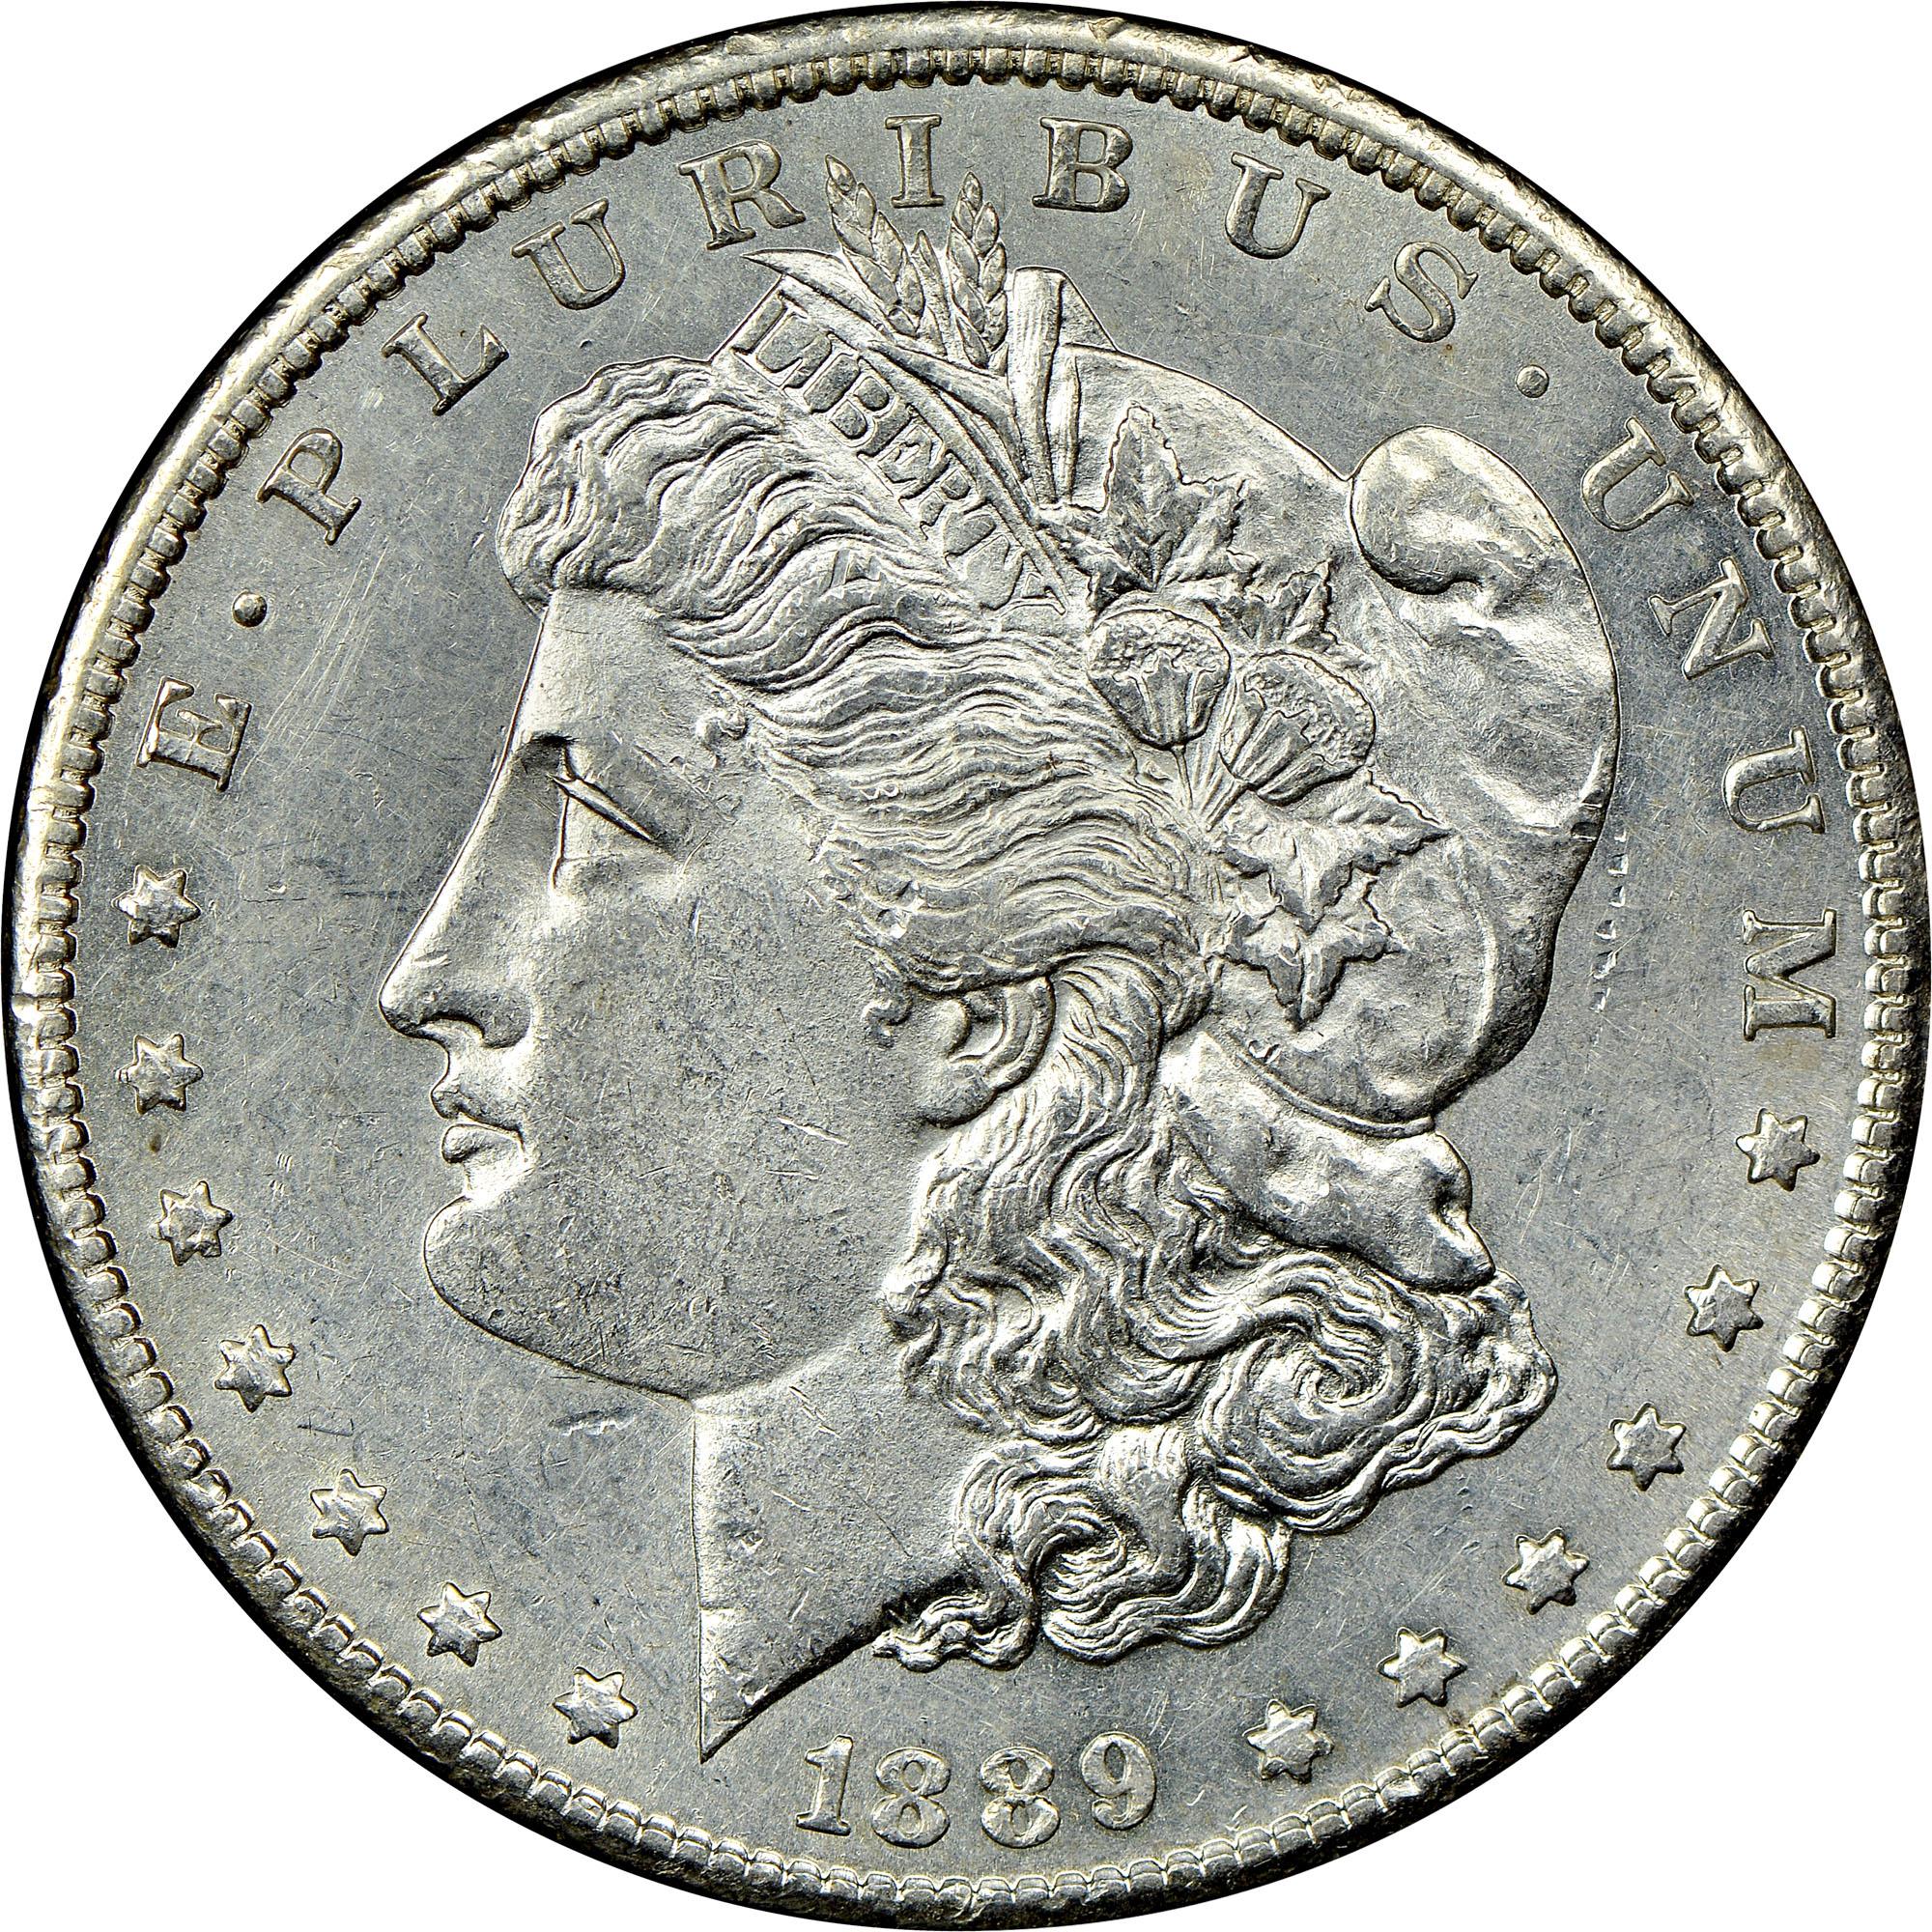 Cc 1 Ms Morgan Dollars